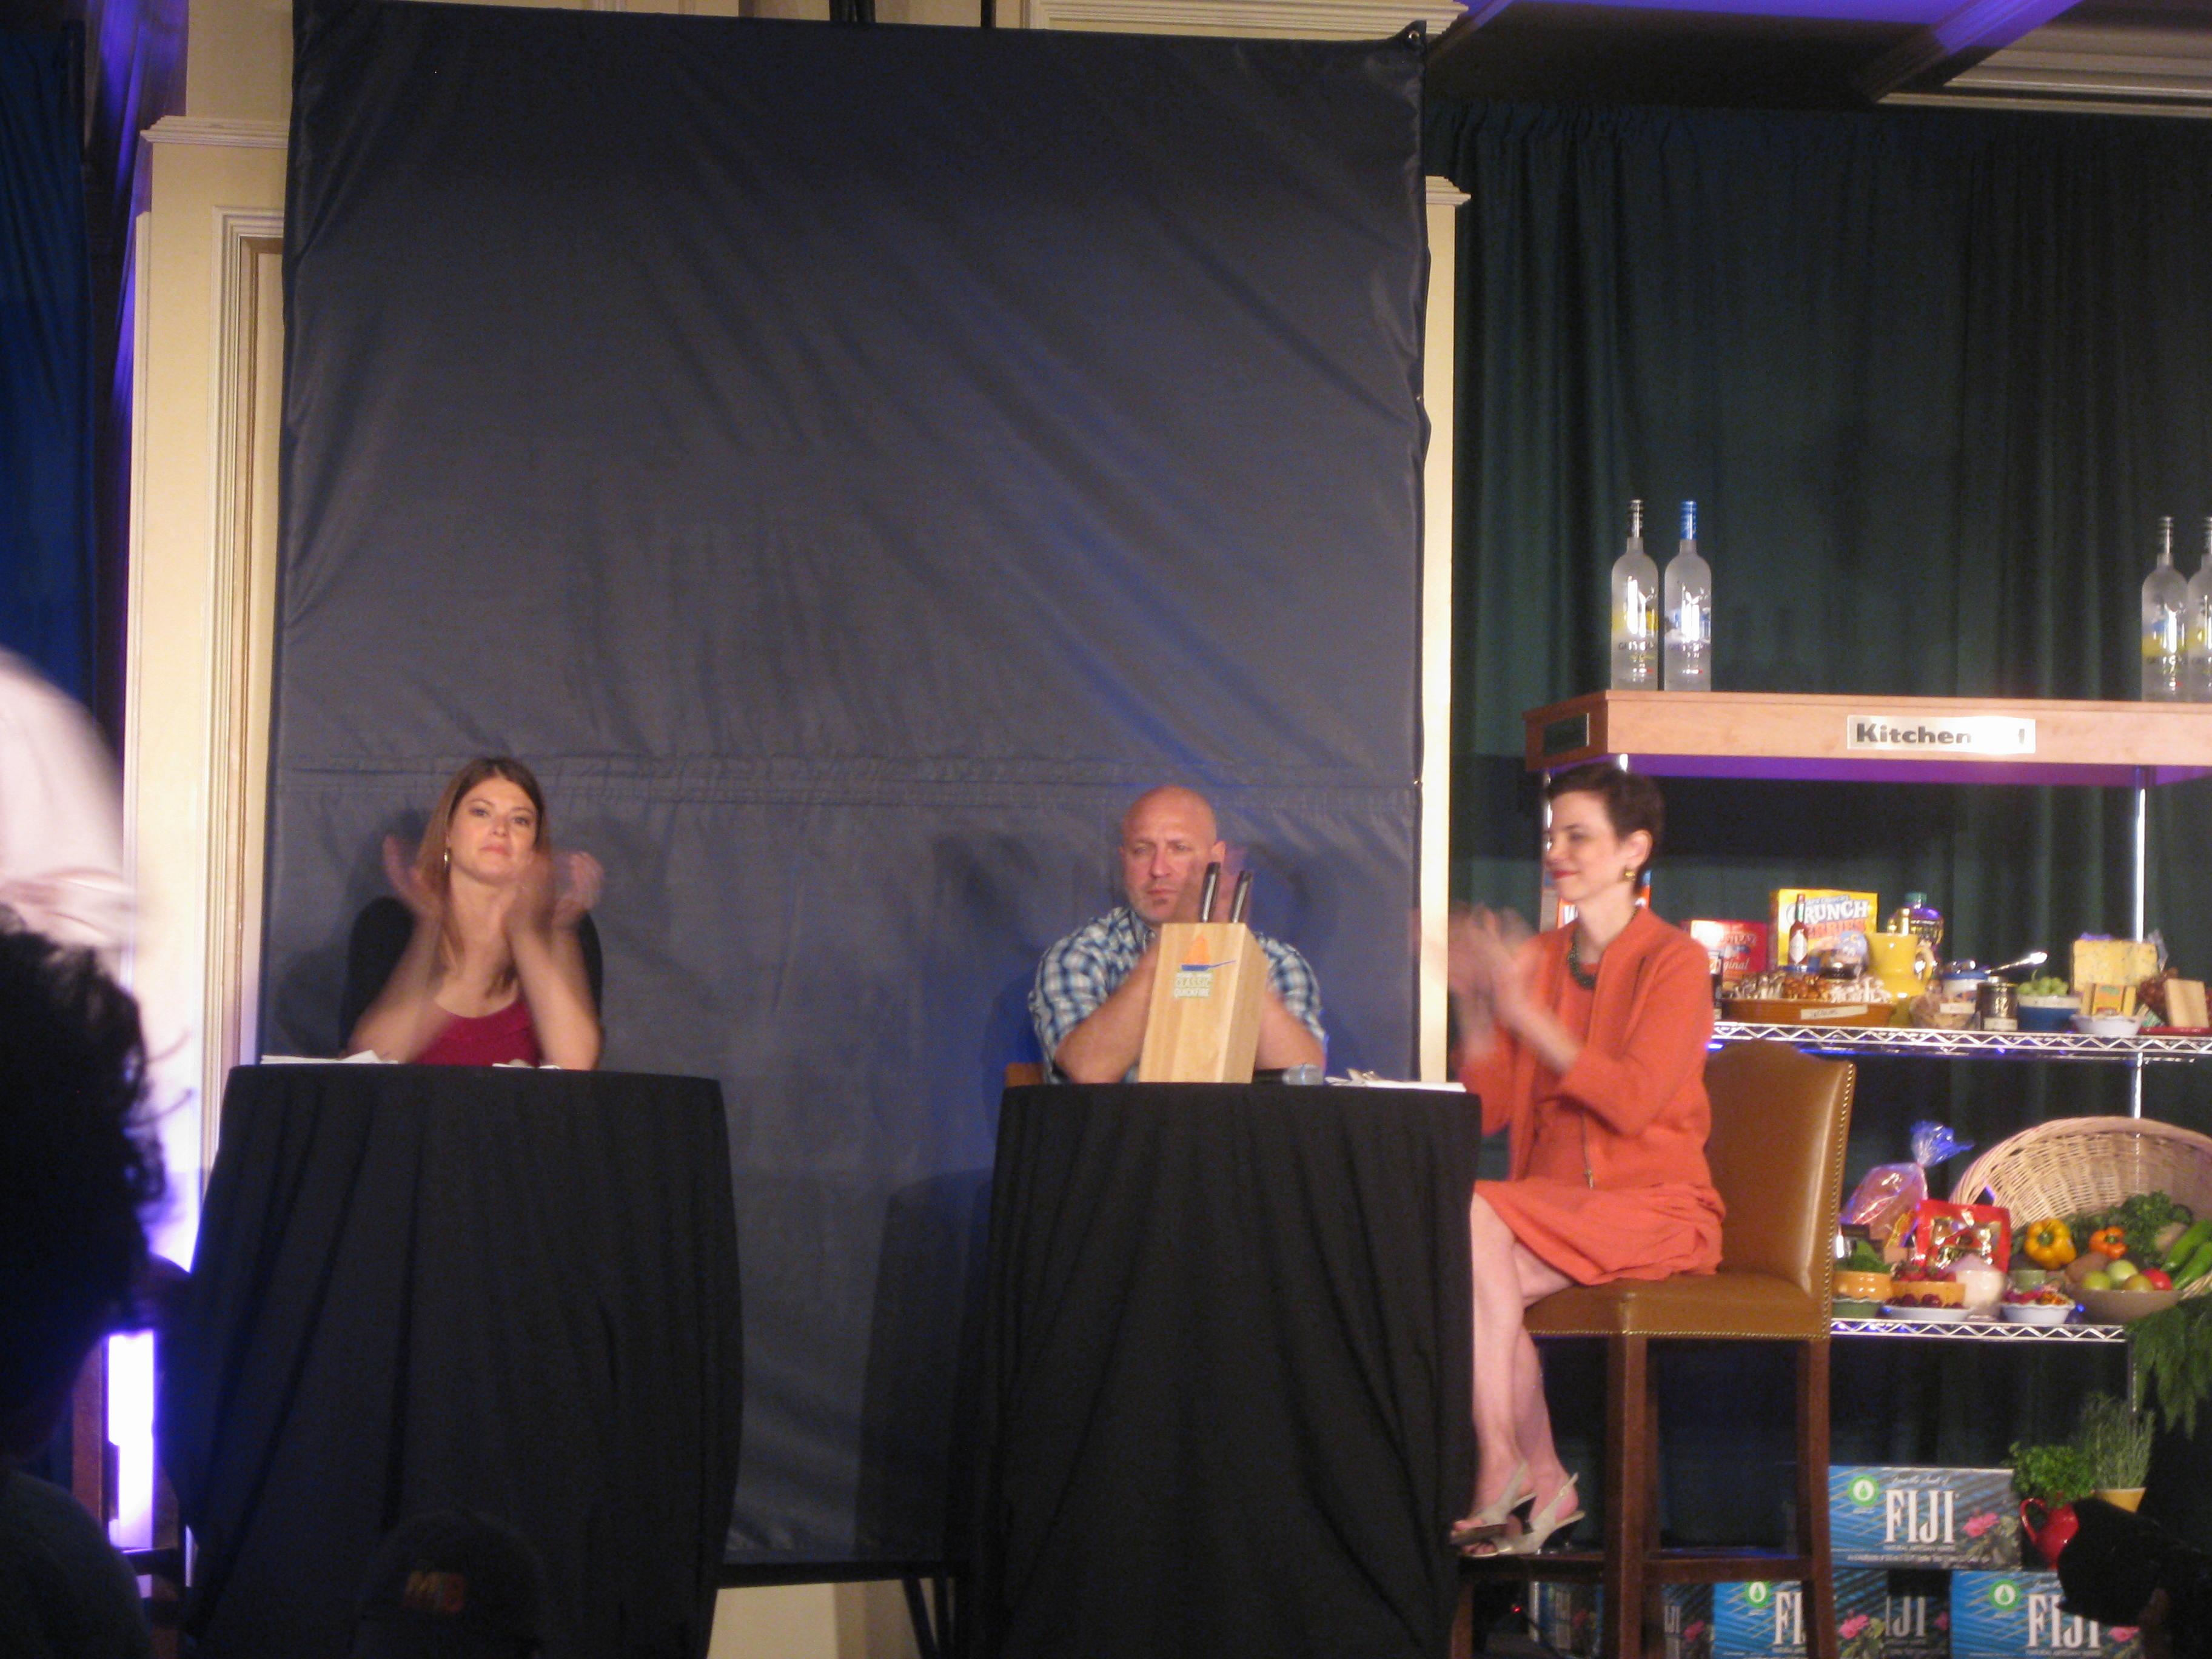 The judges: Gail, Tom, and Dana.